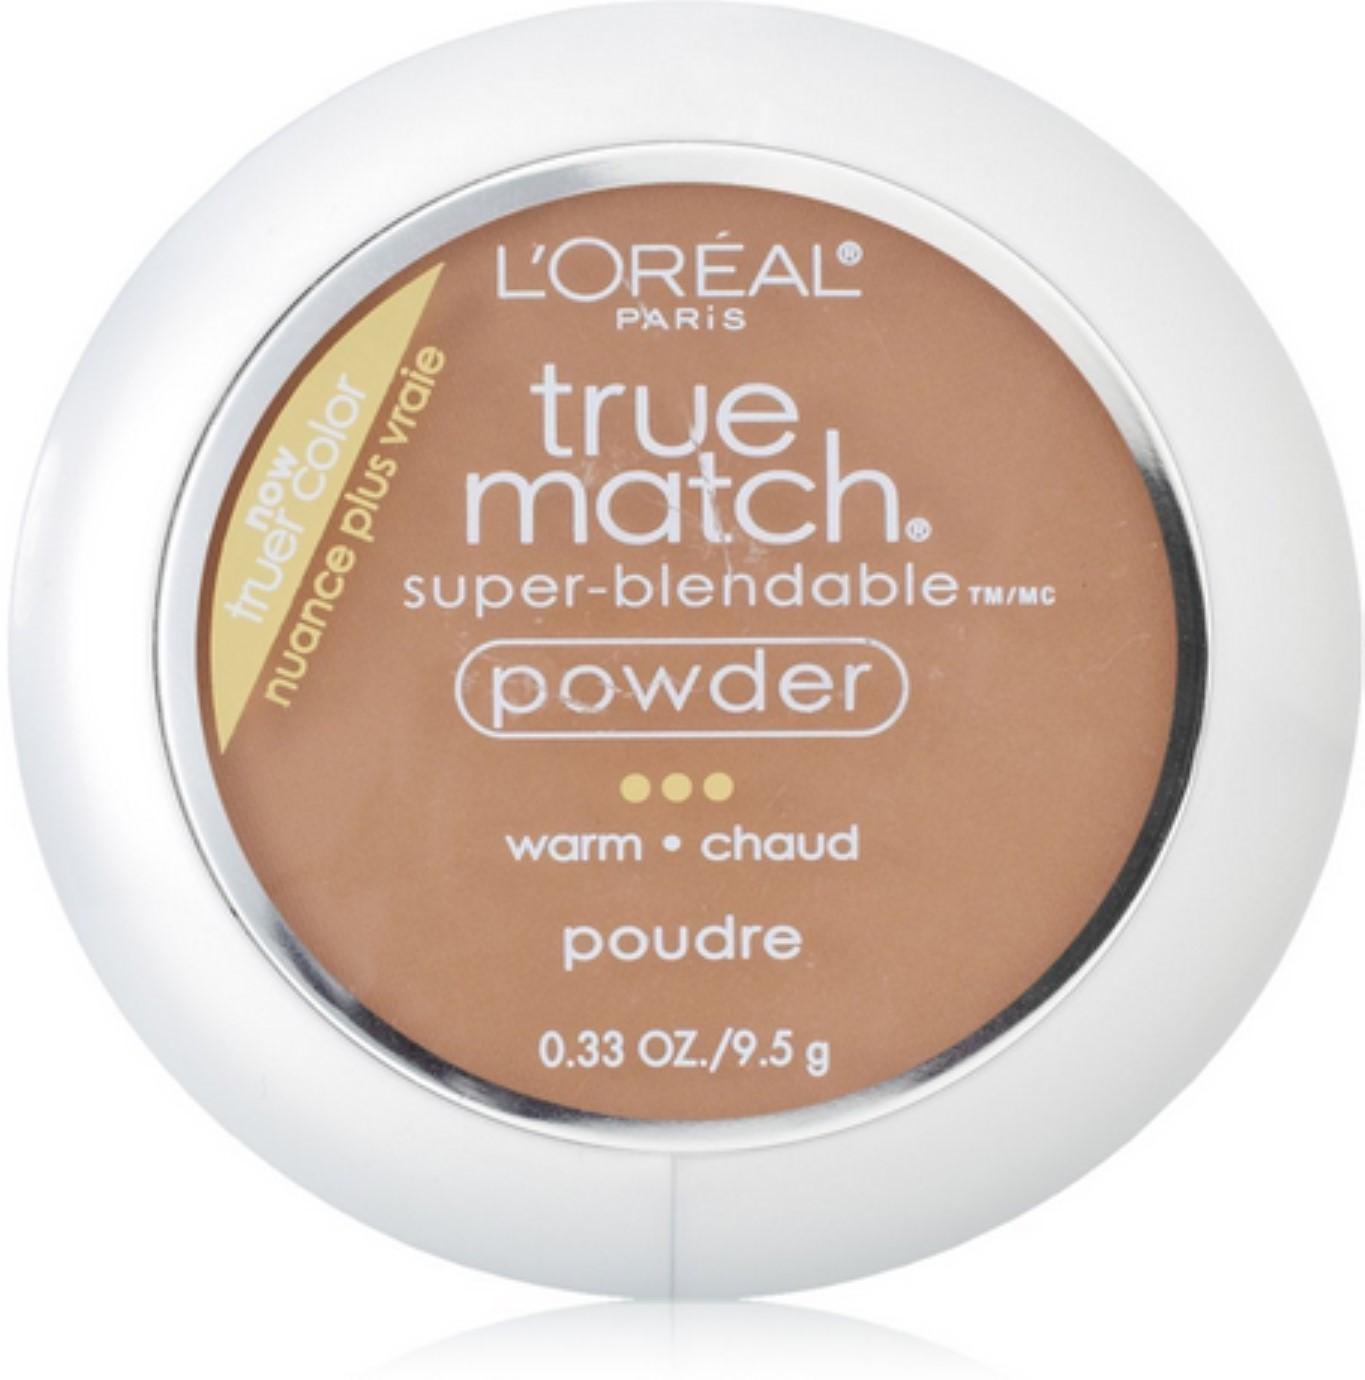 L'Oreal True Match Powder, Creme Cafe [W8], 0.33 oz (Pack of 4)